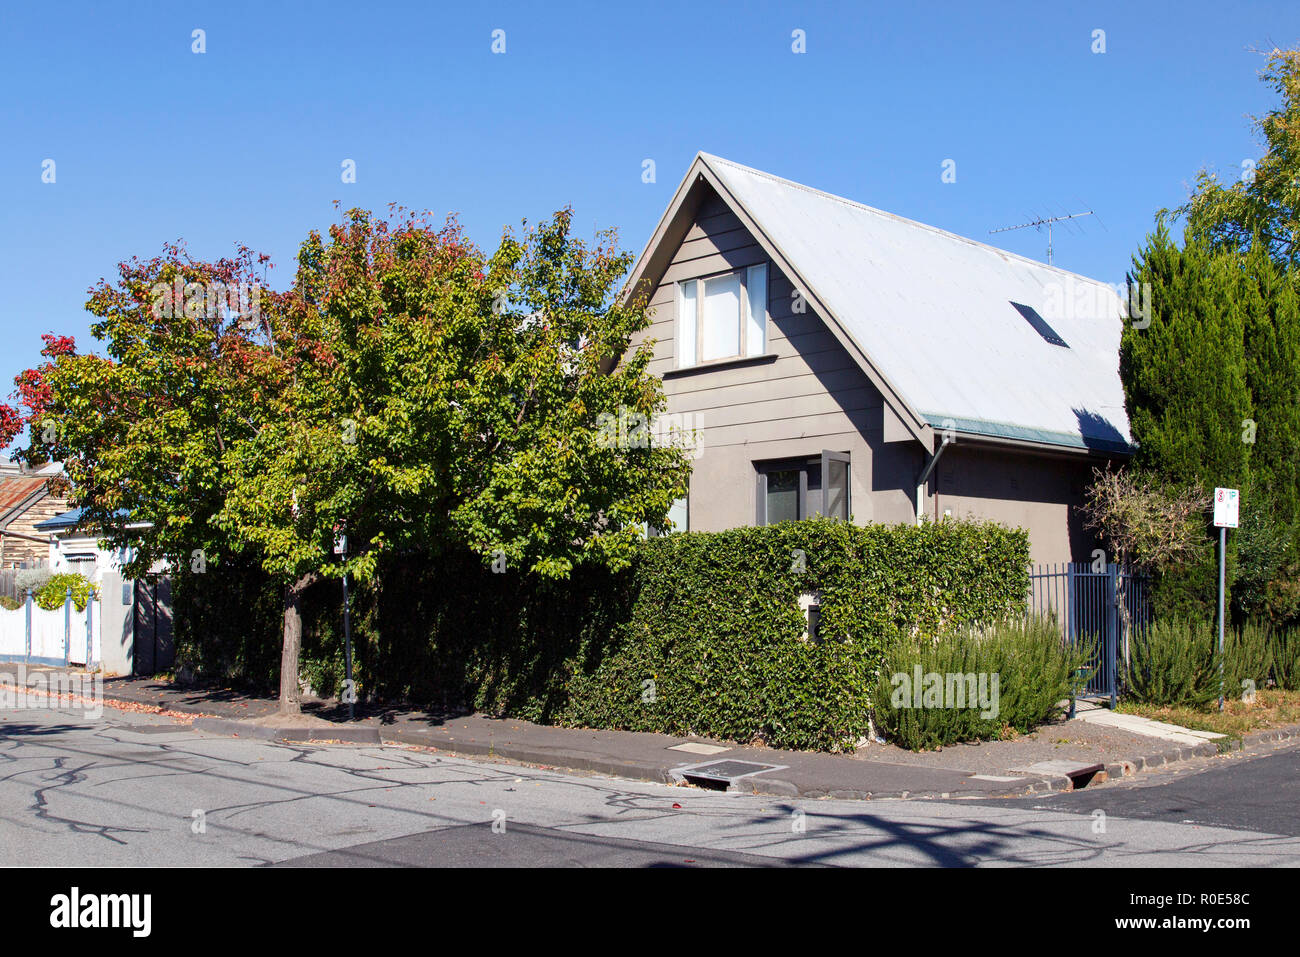 Melbourne Australien 04 April 2018 Freistehendes Chalet Auf